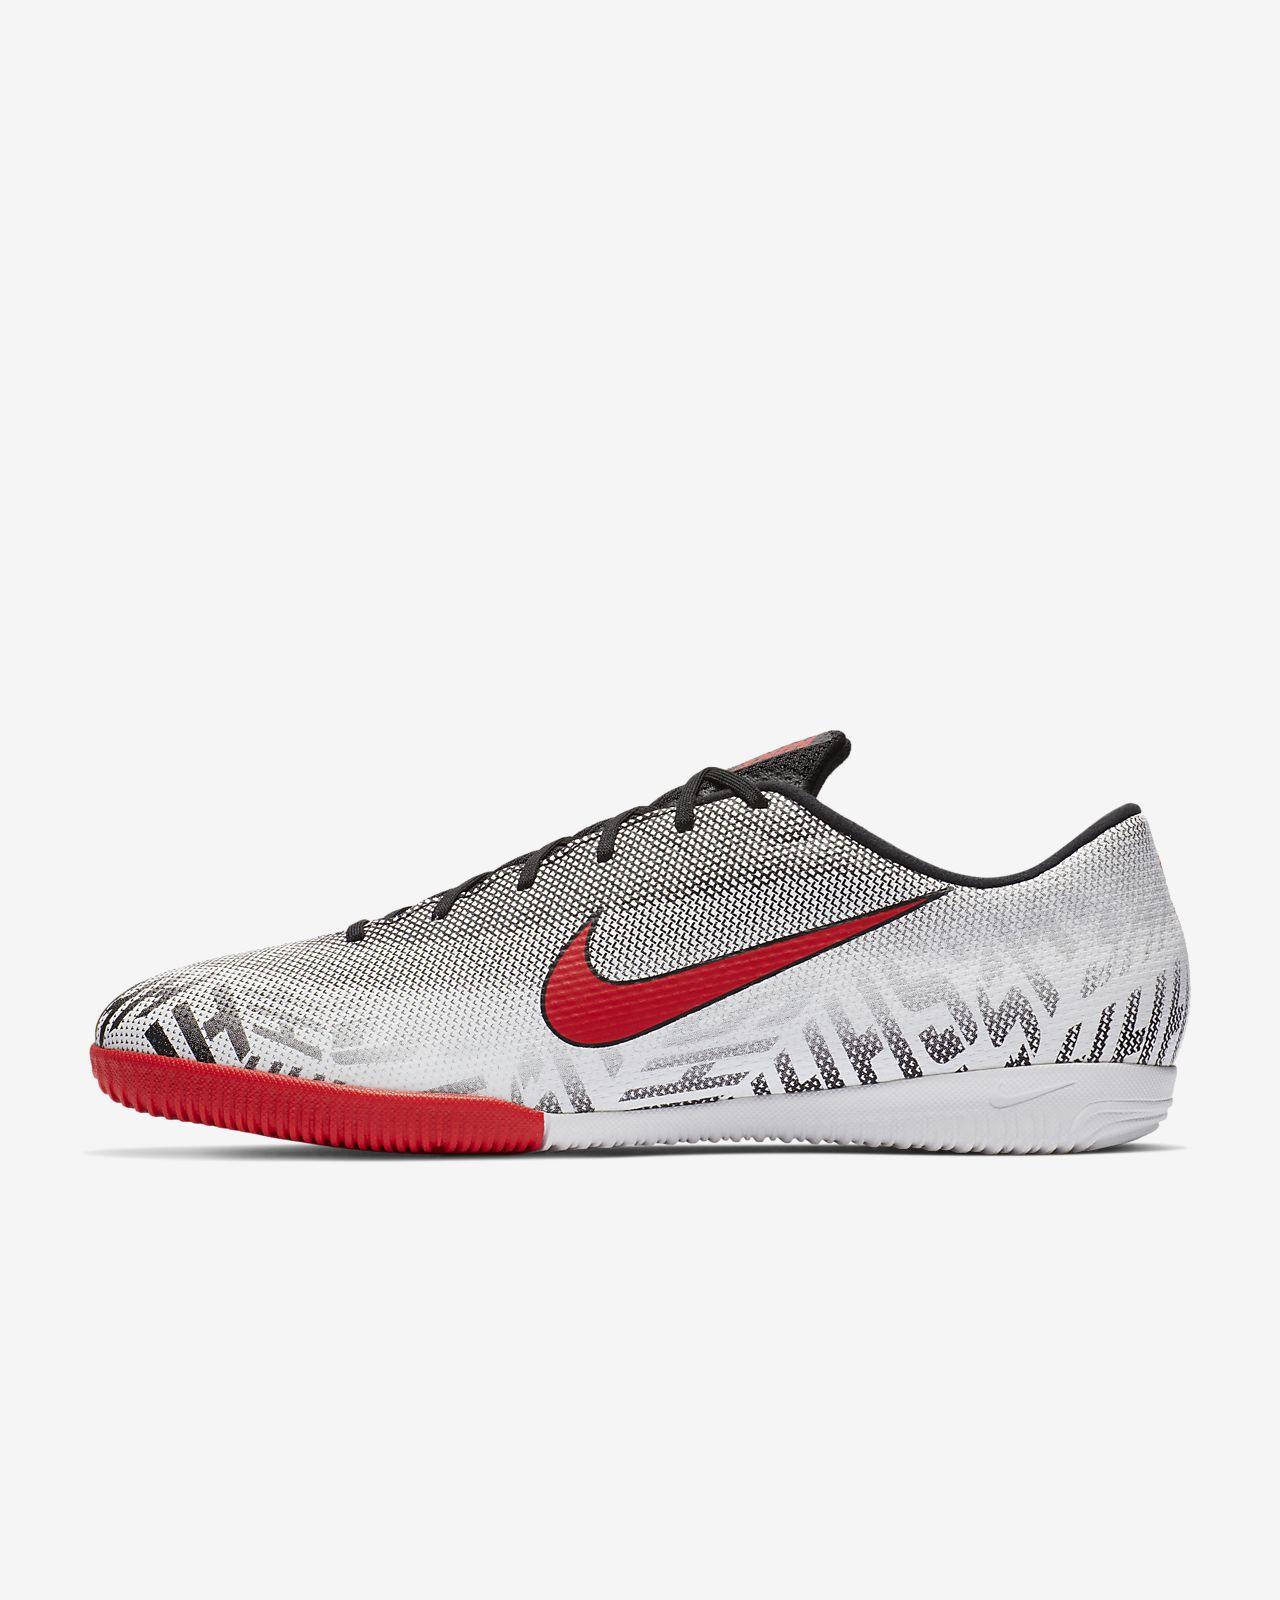 Calzado de fútbol para cancha cubierta Nike Mercurial Vapor XII Academy Neymar  Jr 4a8f33785a9